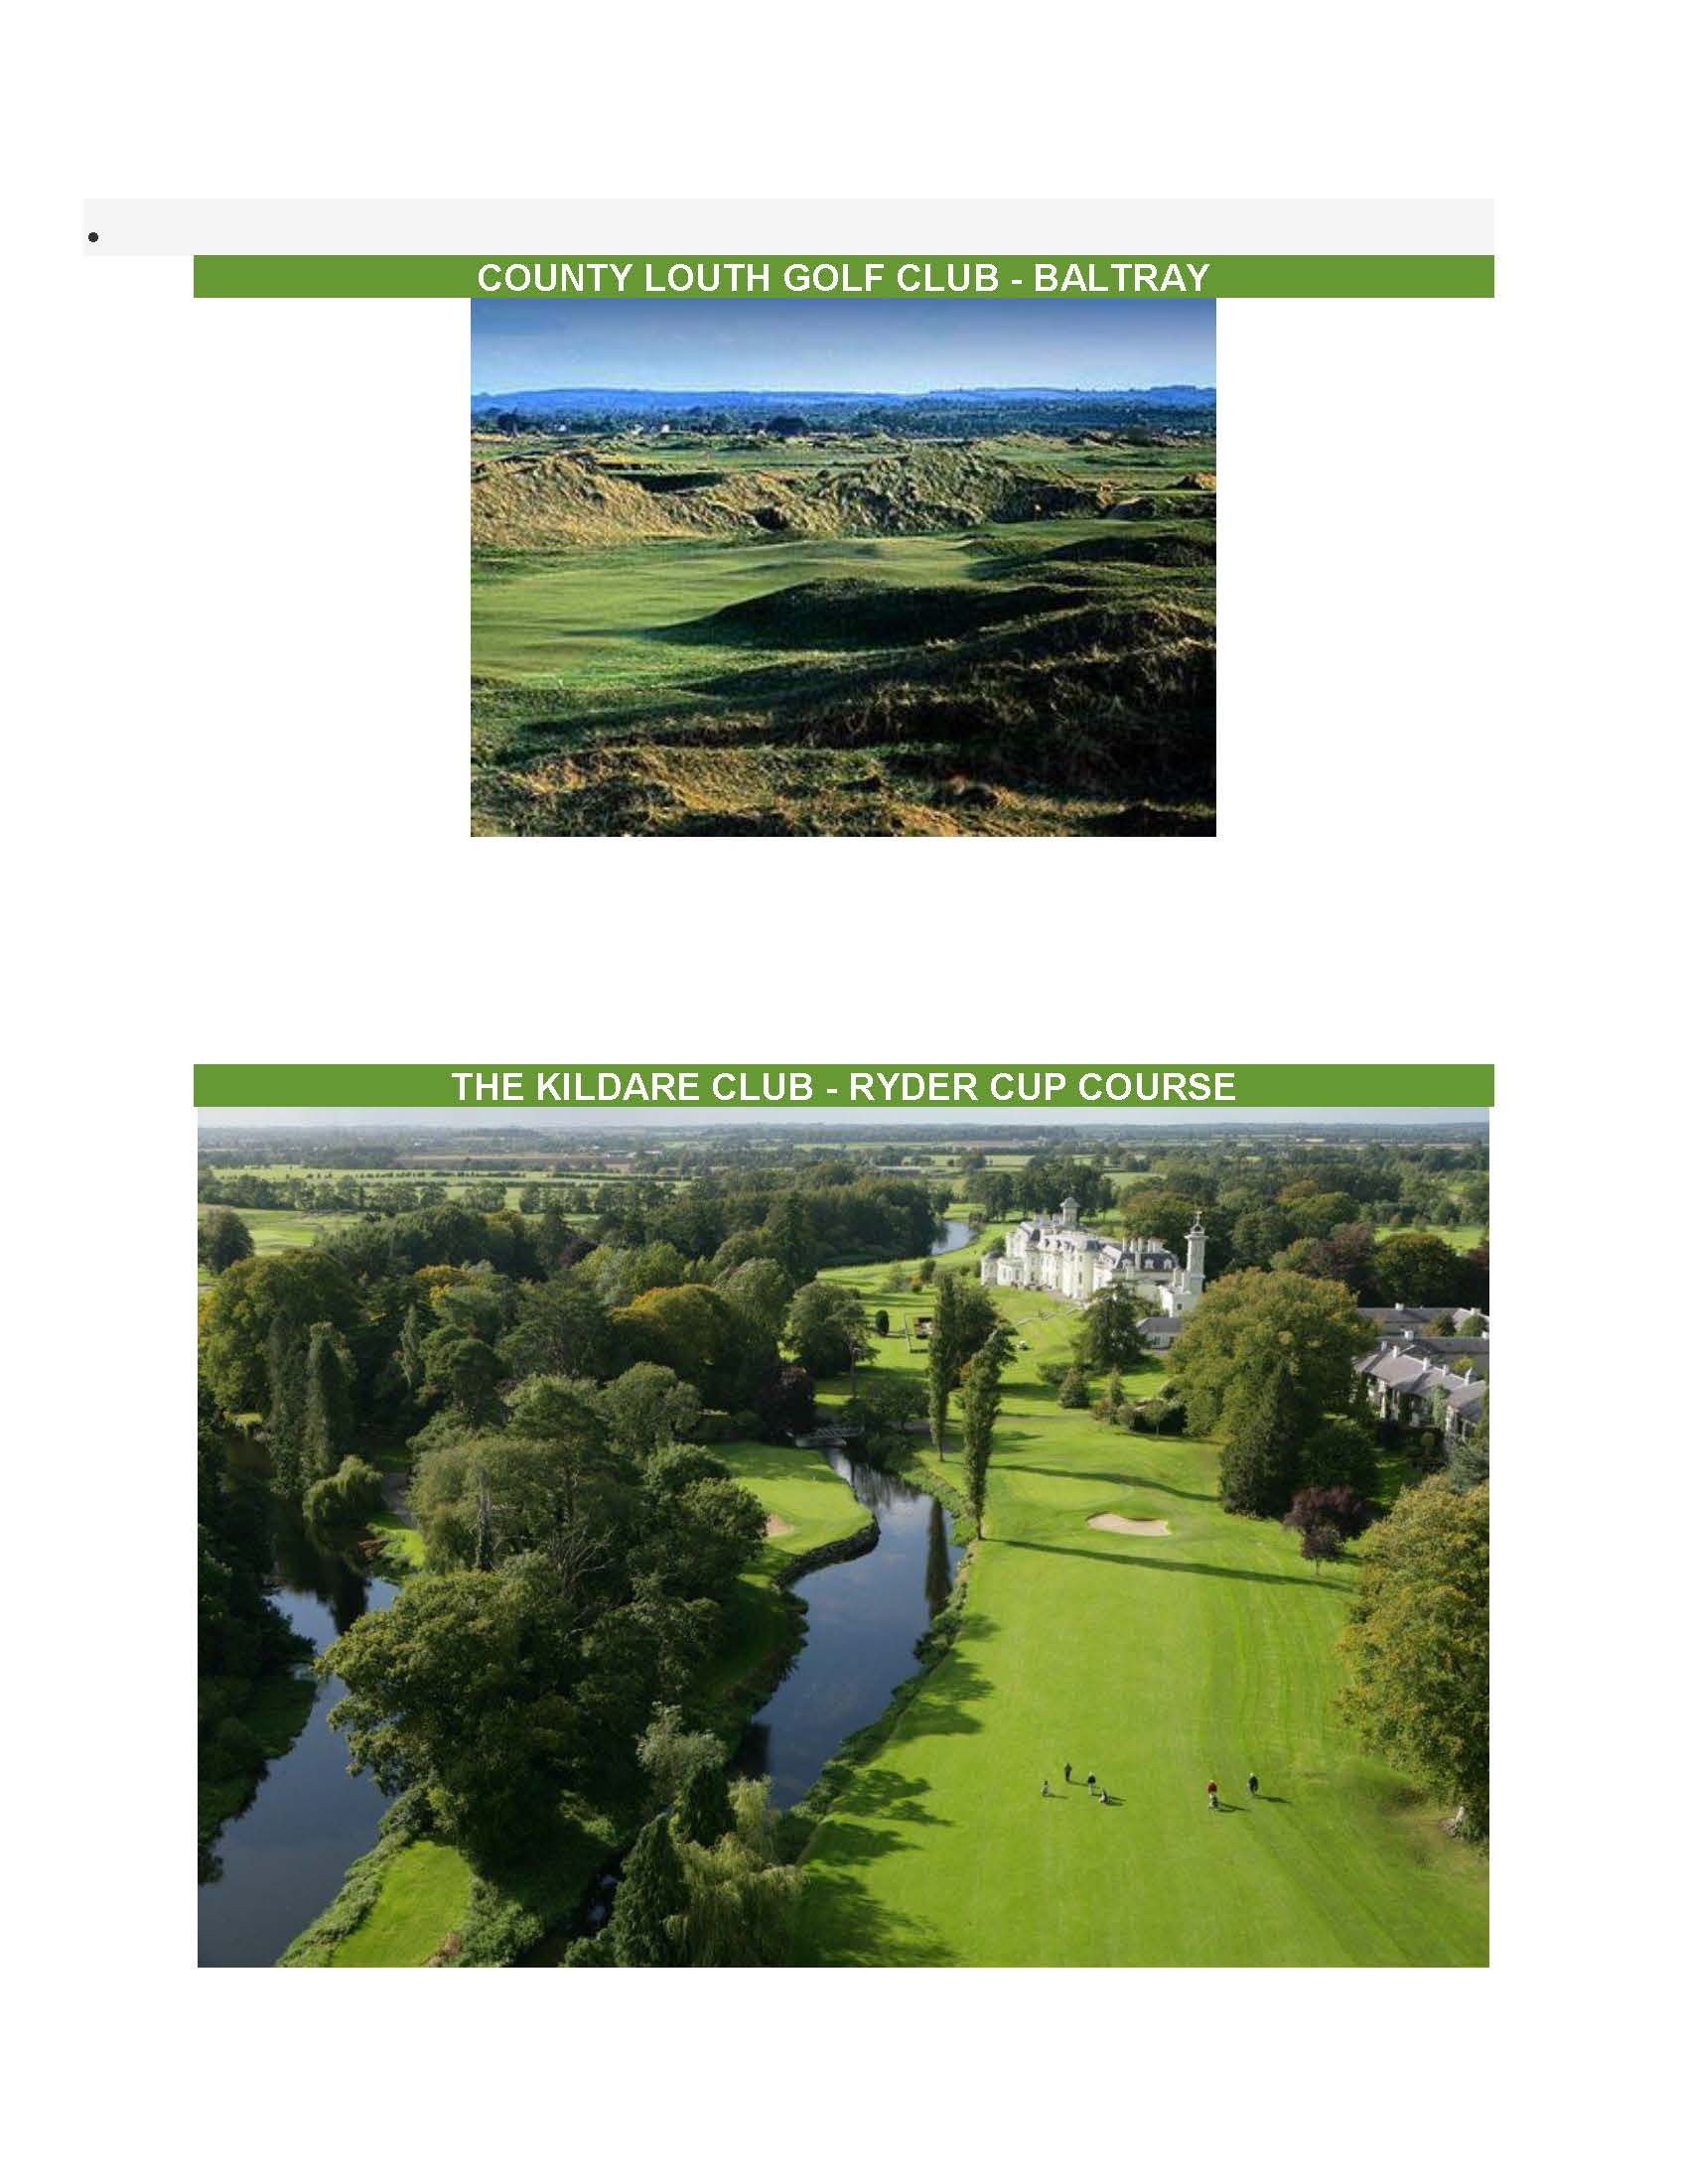 Dublin Ireland Tour Golf Edited_Page_2.jpg